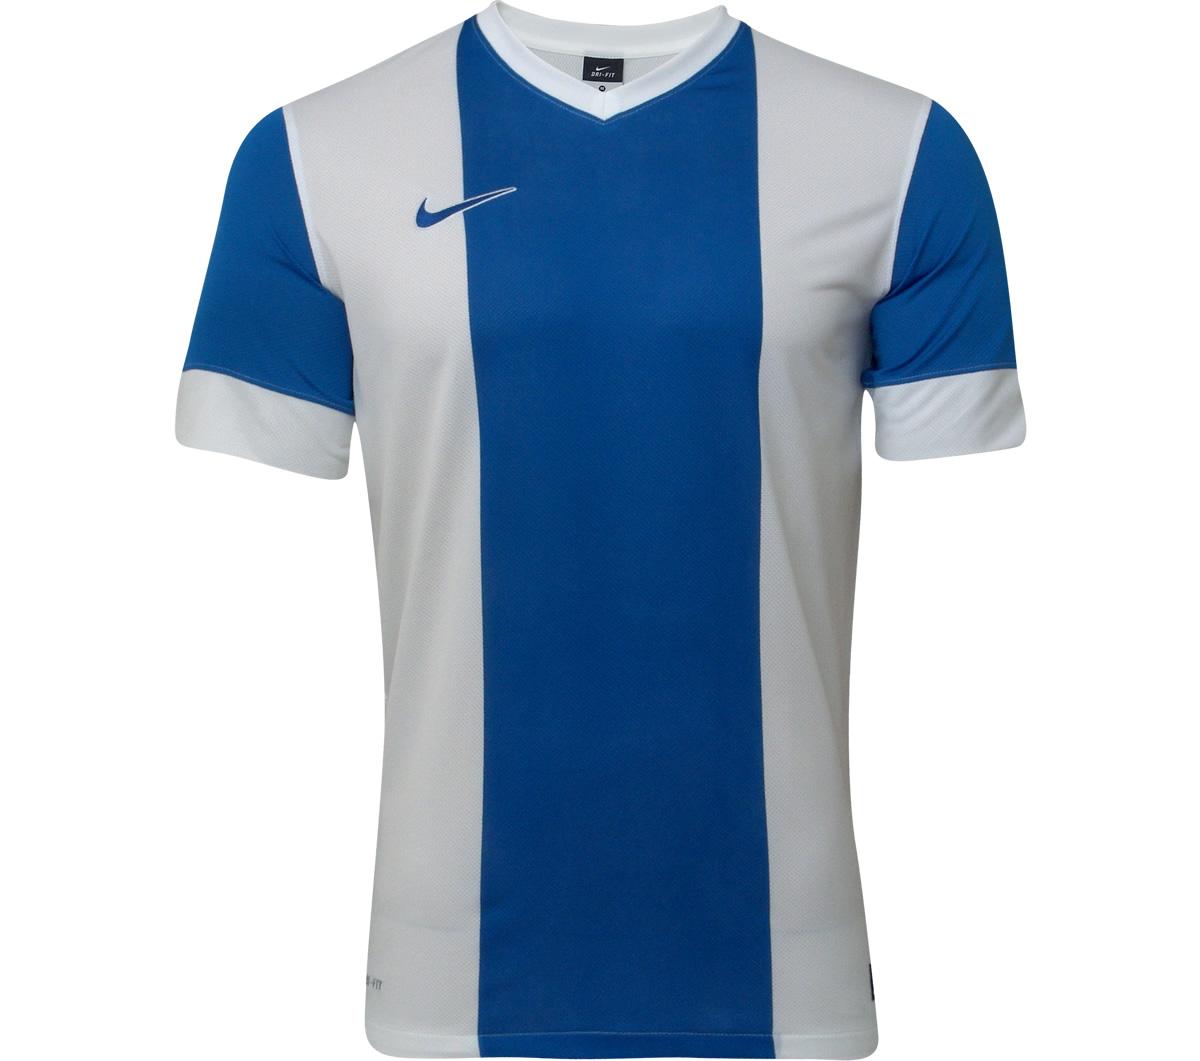 Camisa Nike Energy II Azul e Branca